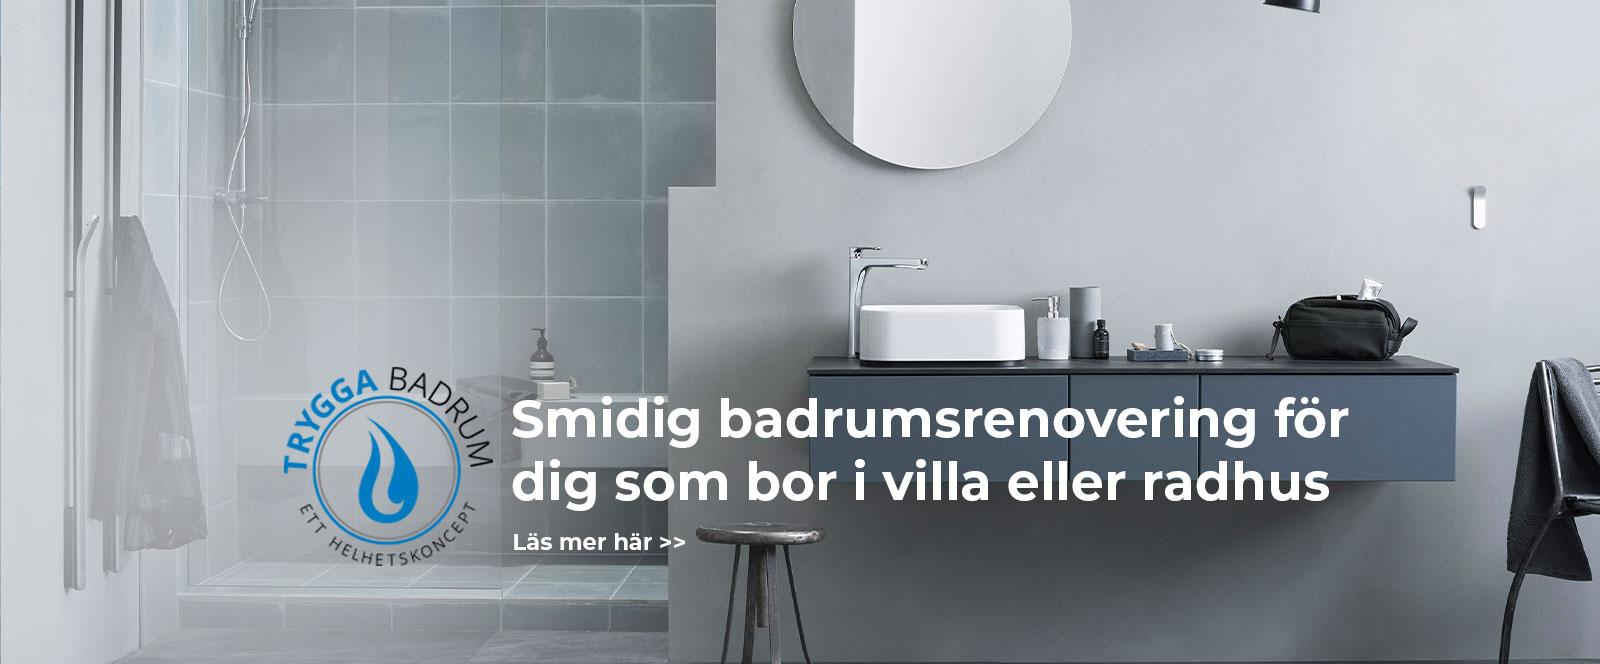 Badrumsrenovering i villa eller radhus